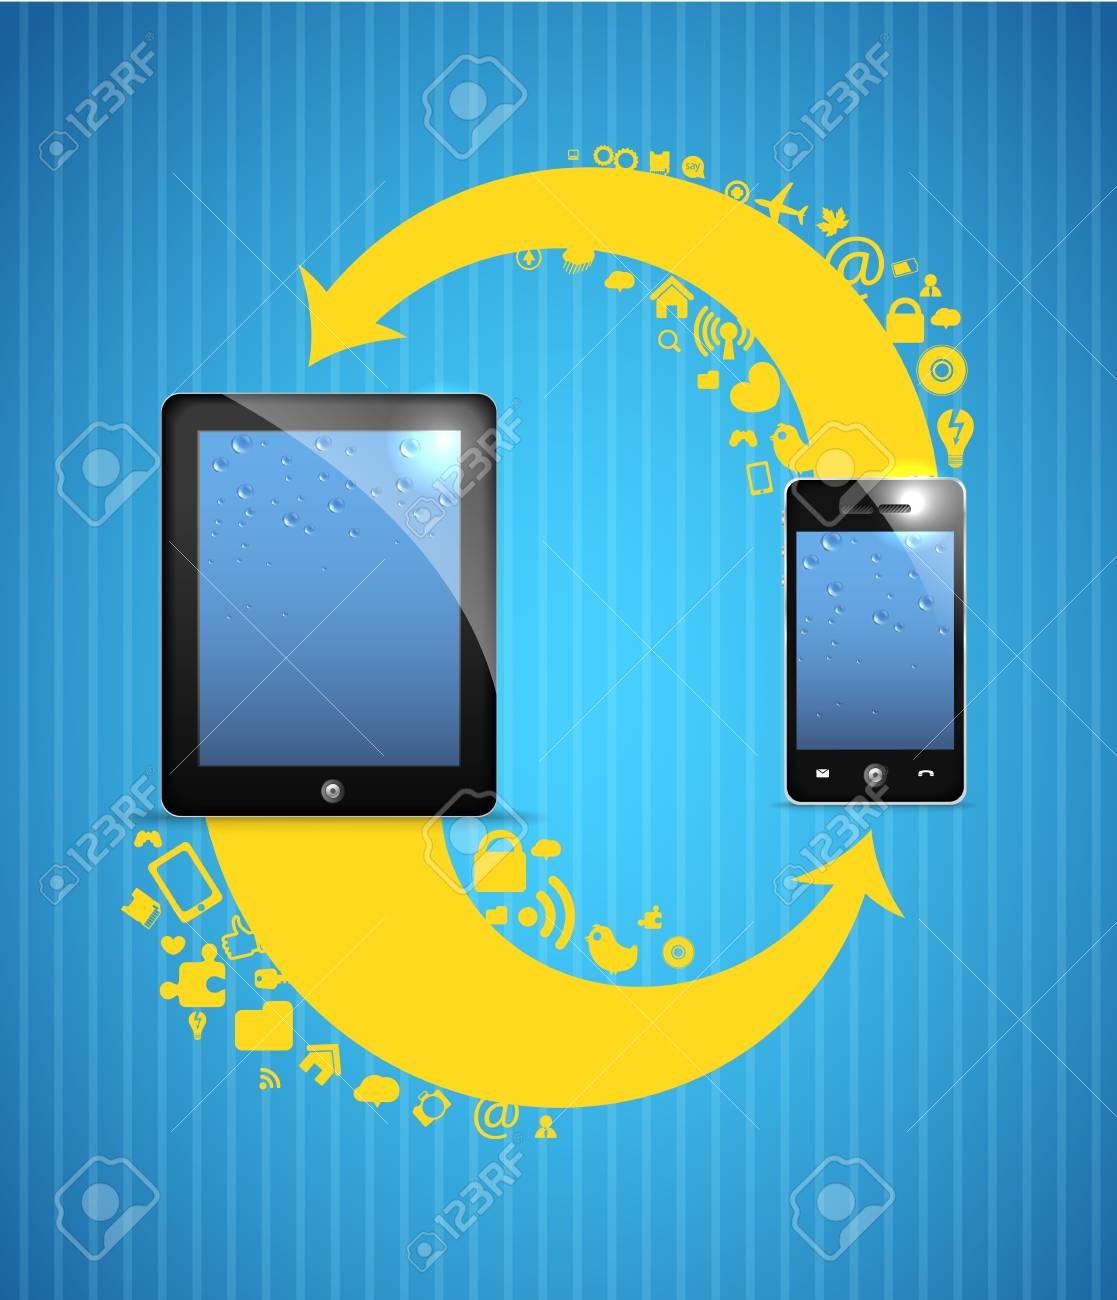 Circulation of media information in social networks Stock Vector - 13718551